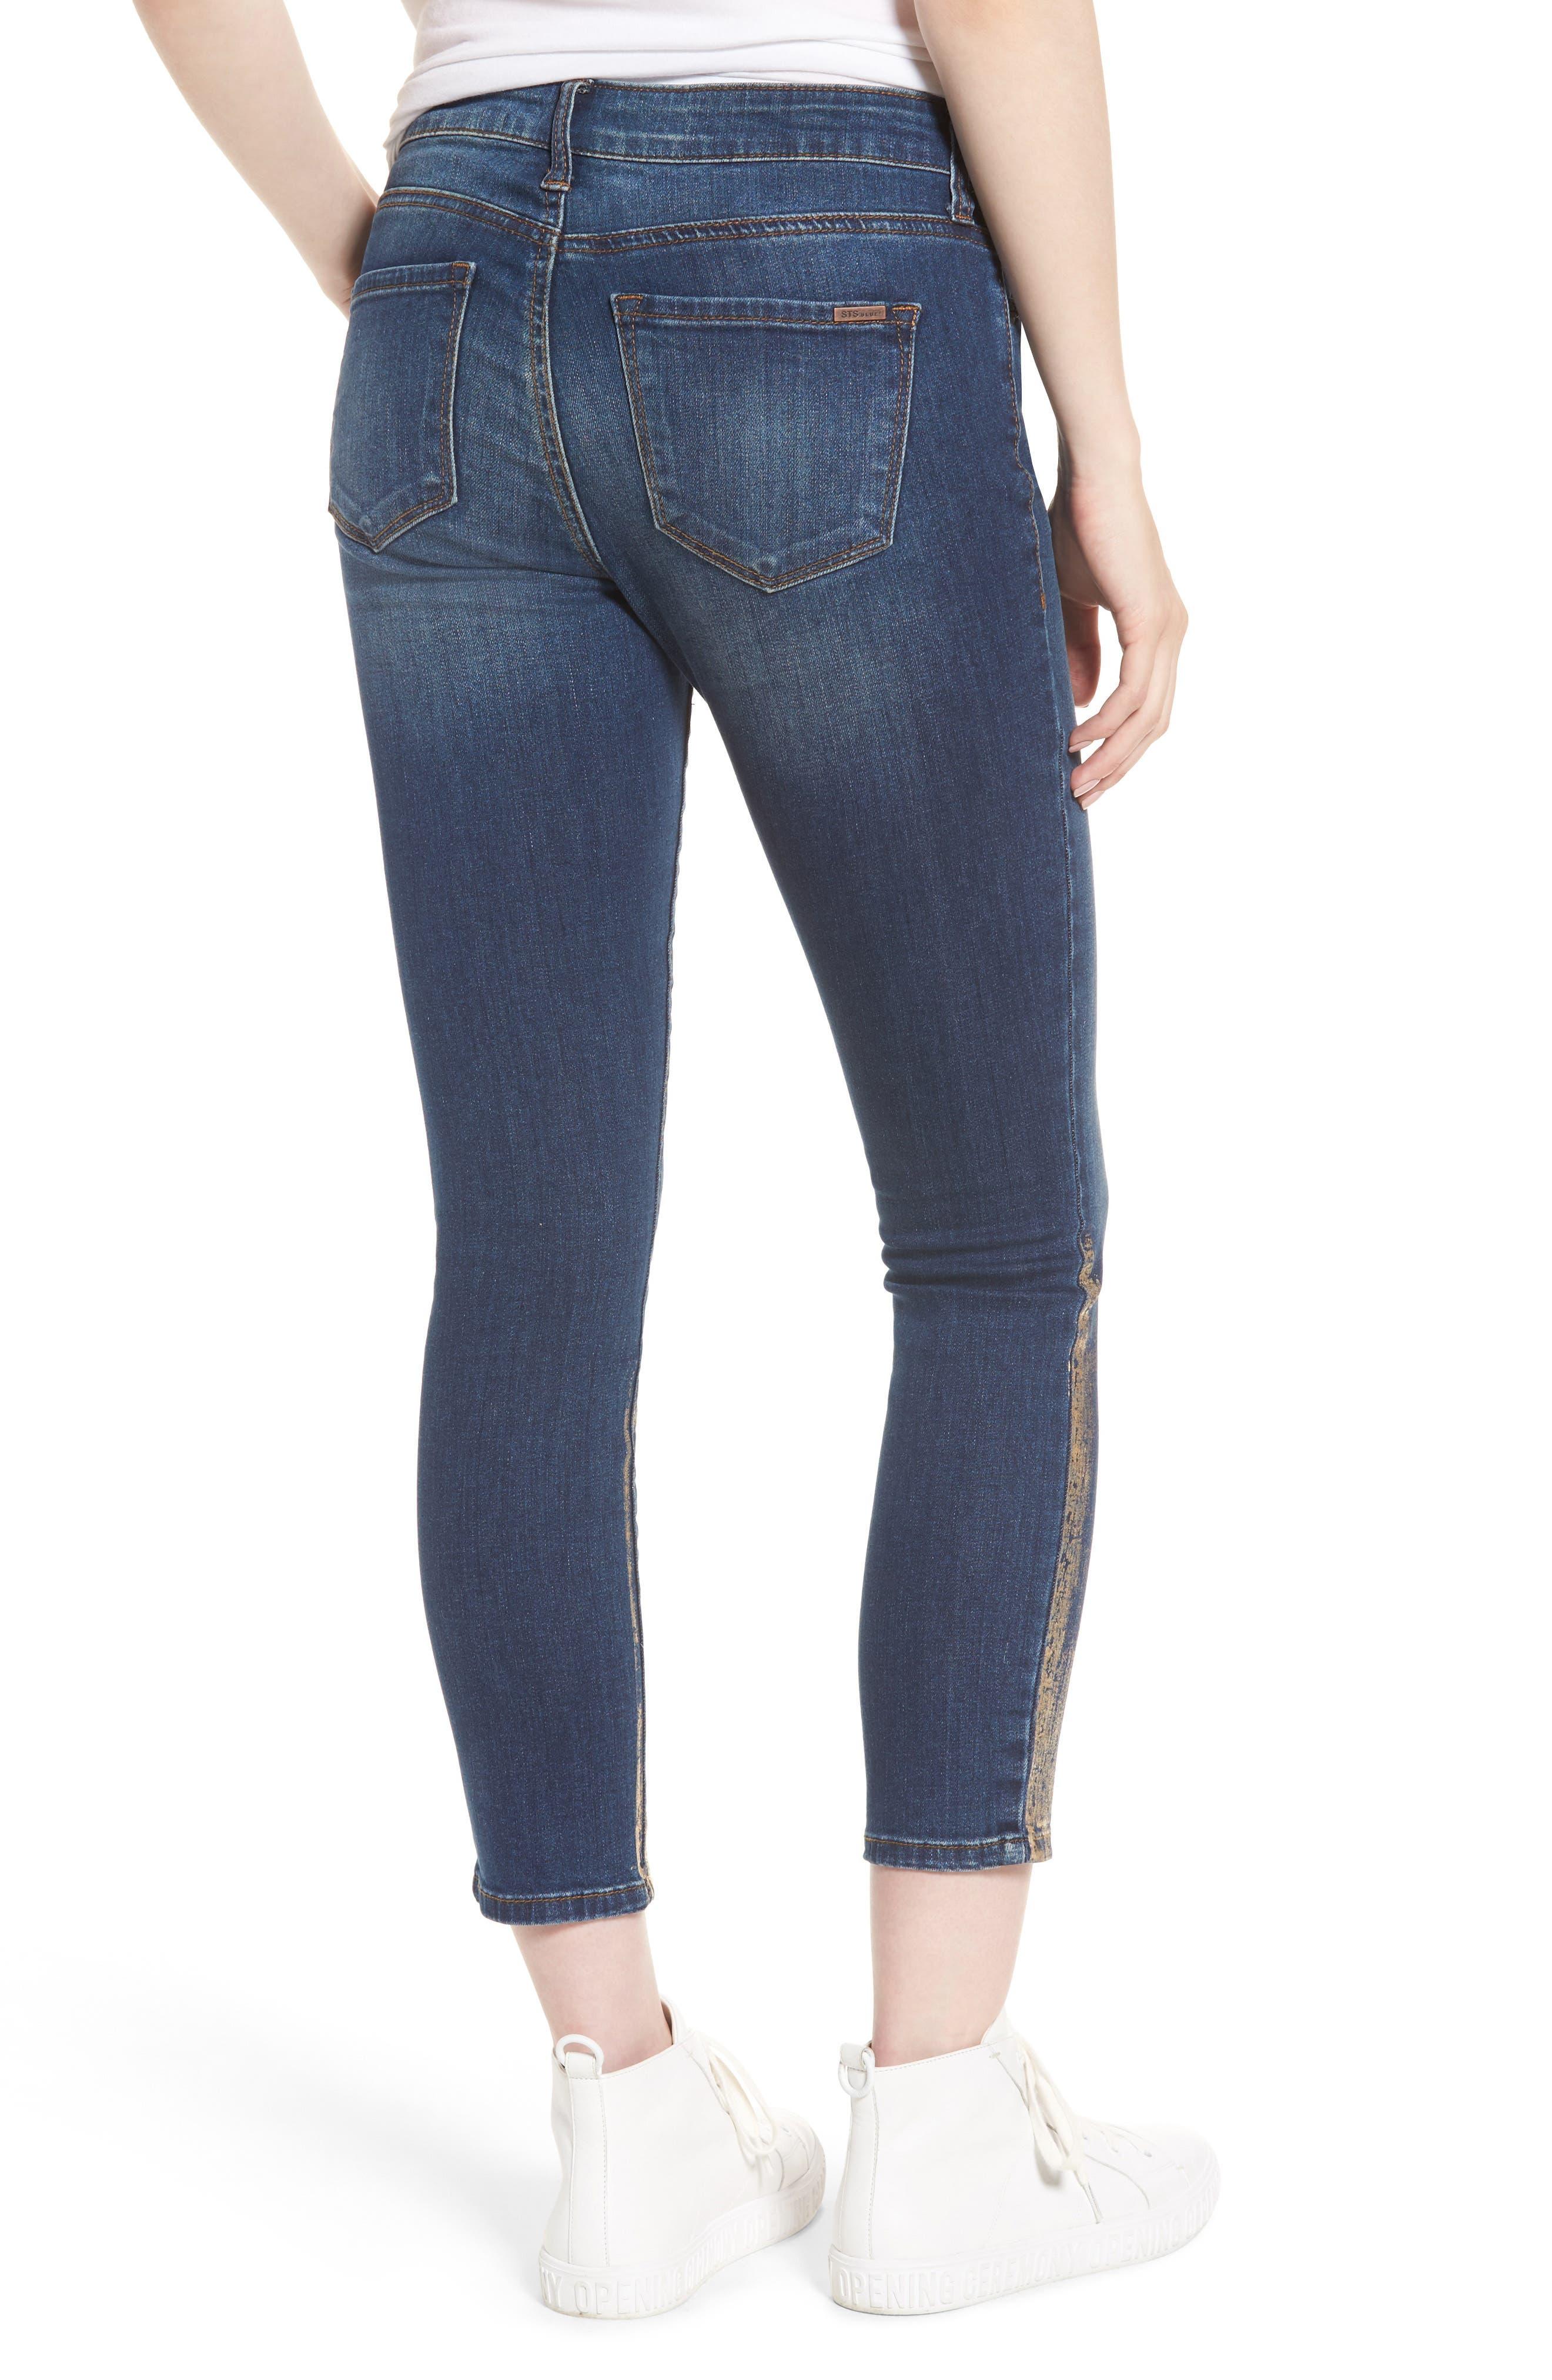 Piper Foil Crop Skinny Jeans,                             Alternate thumbnail 2, color,                             400